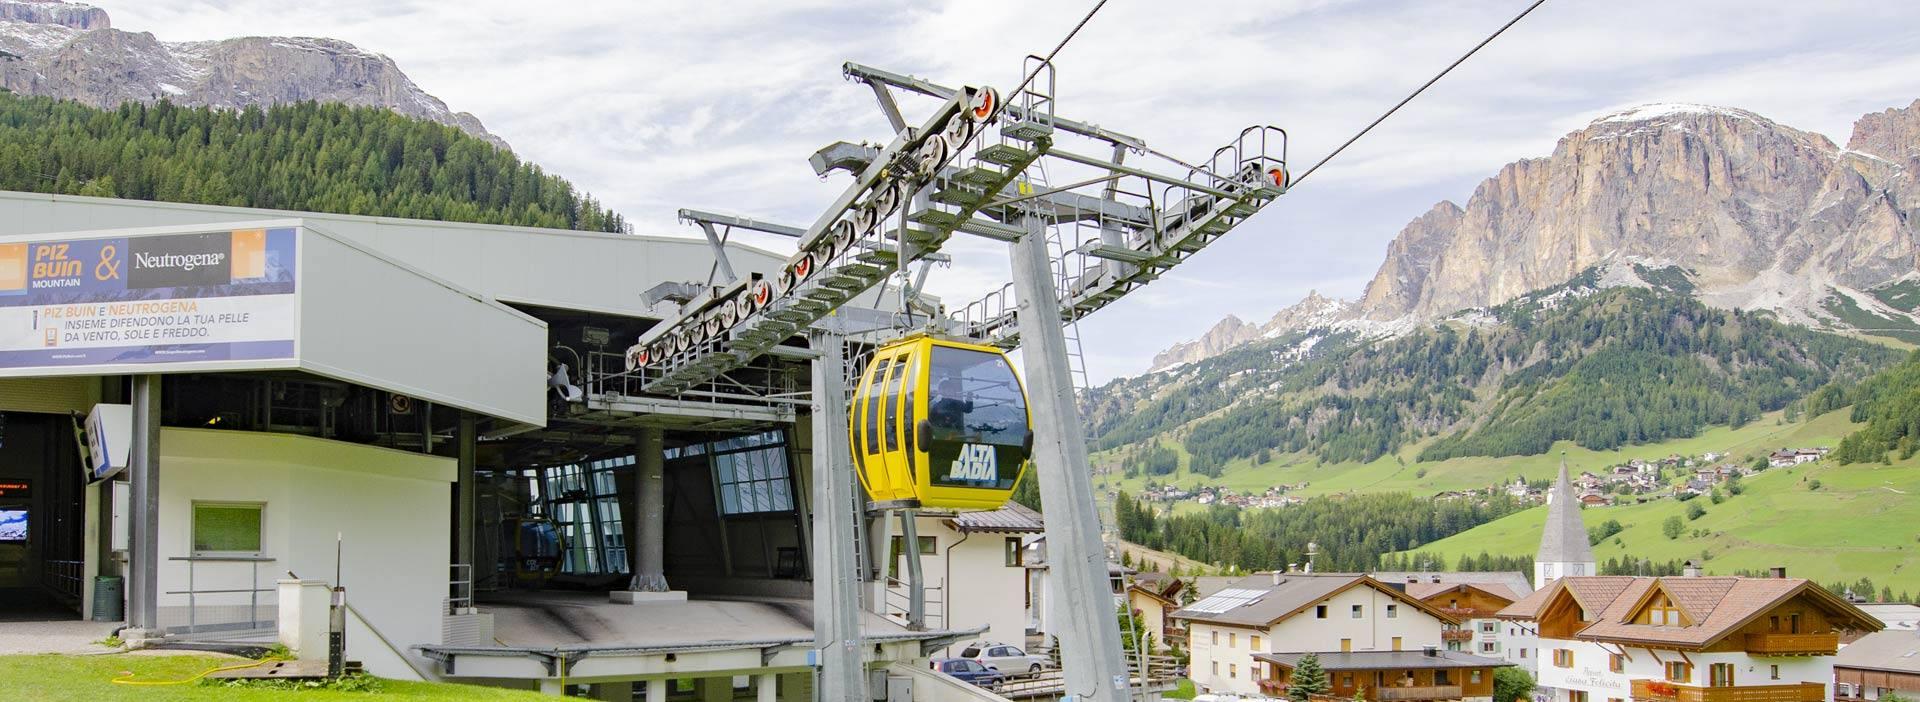 Kabinenbahn Col Alto